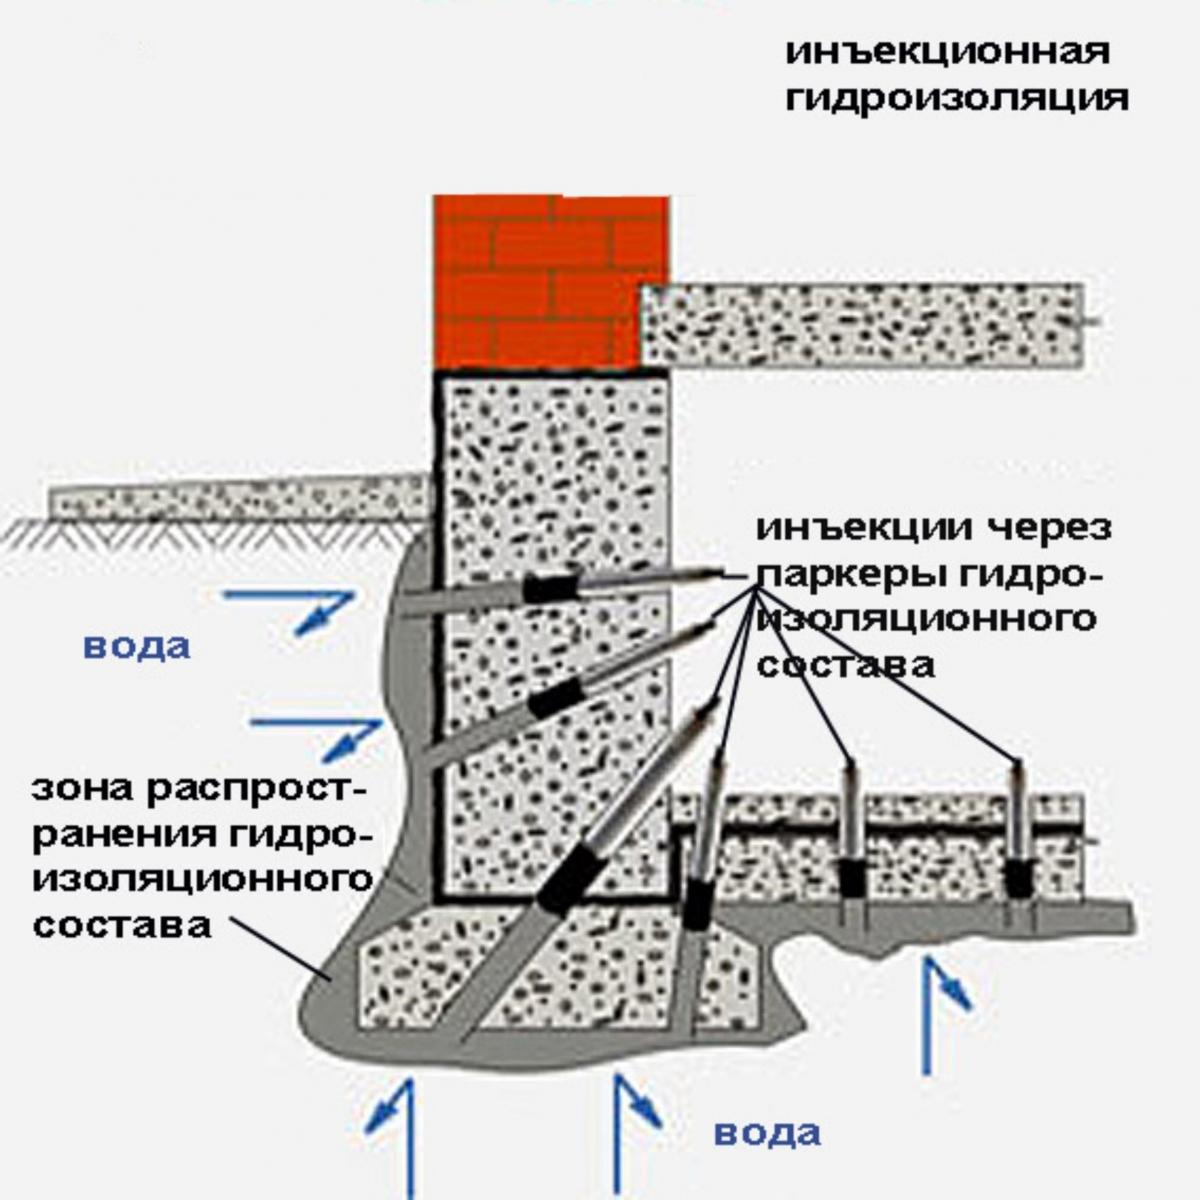 Противокапиллярная гидроизоляция материалы внутреняя гидроизоляция на фундамента фото